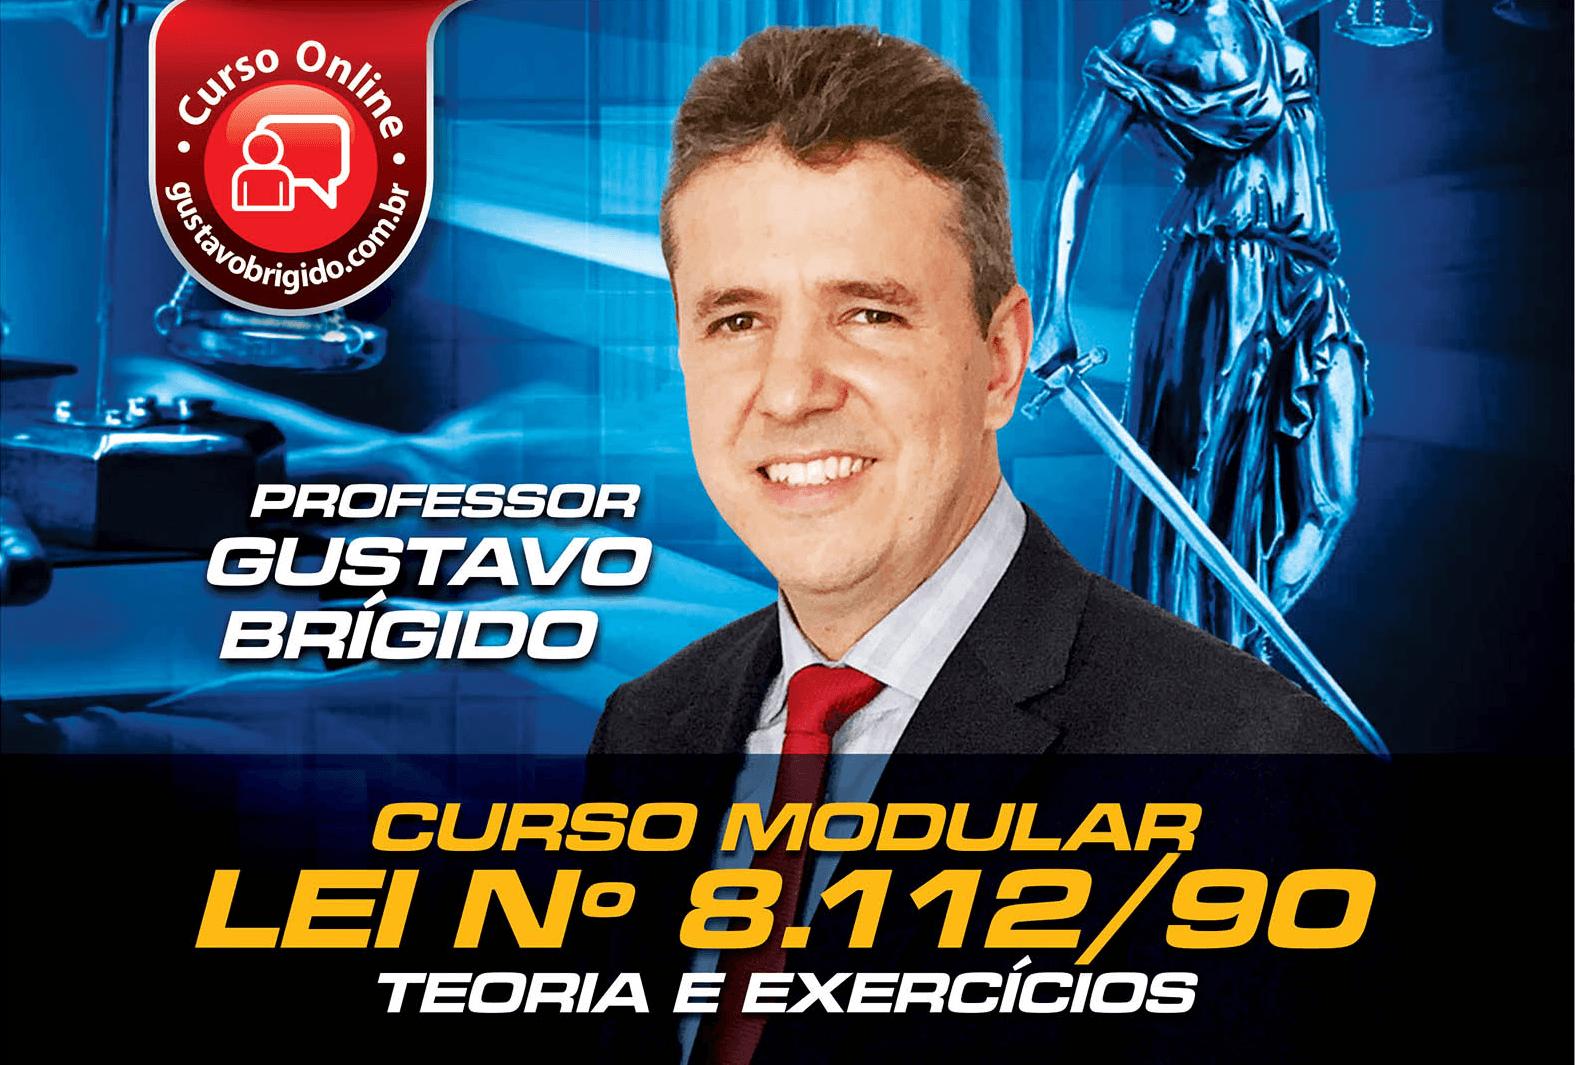 Lei 8.112/90 - Professor Gustavo Brígido